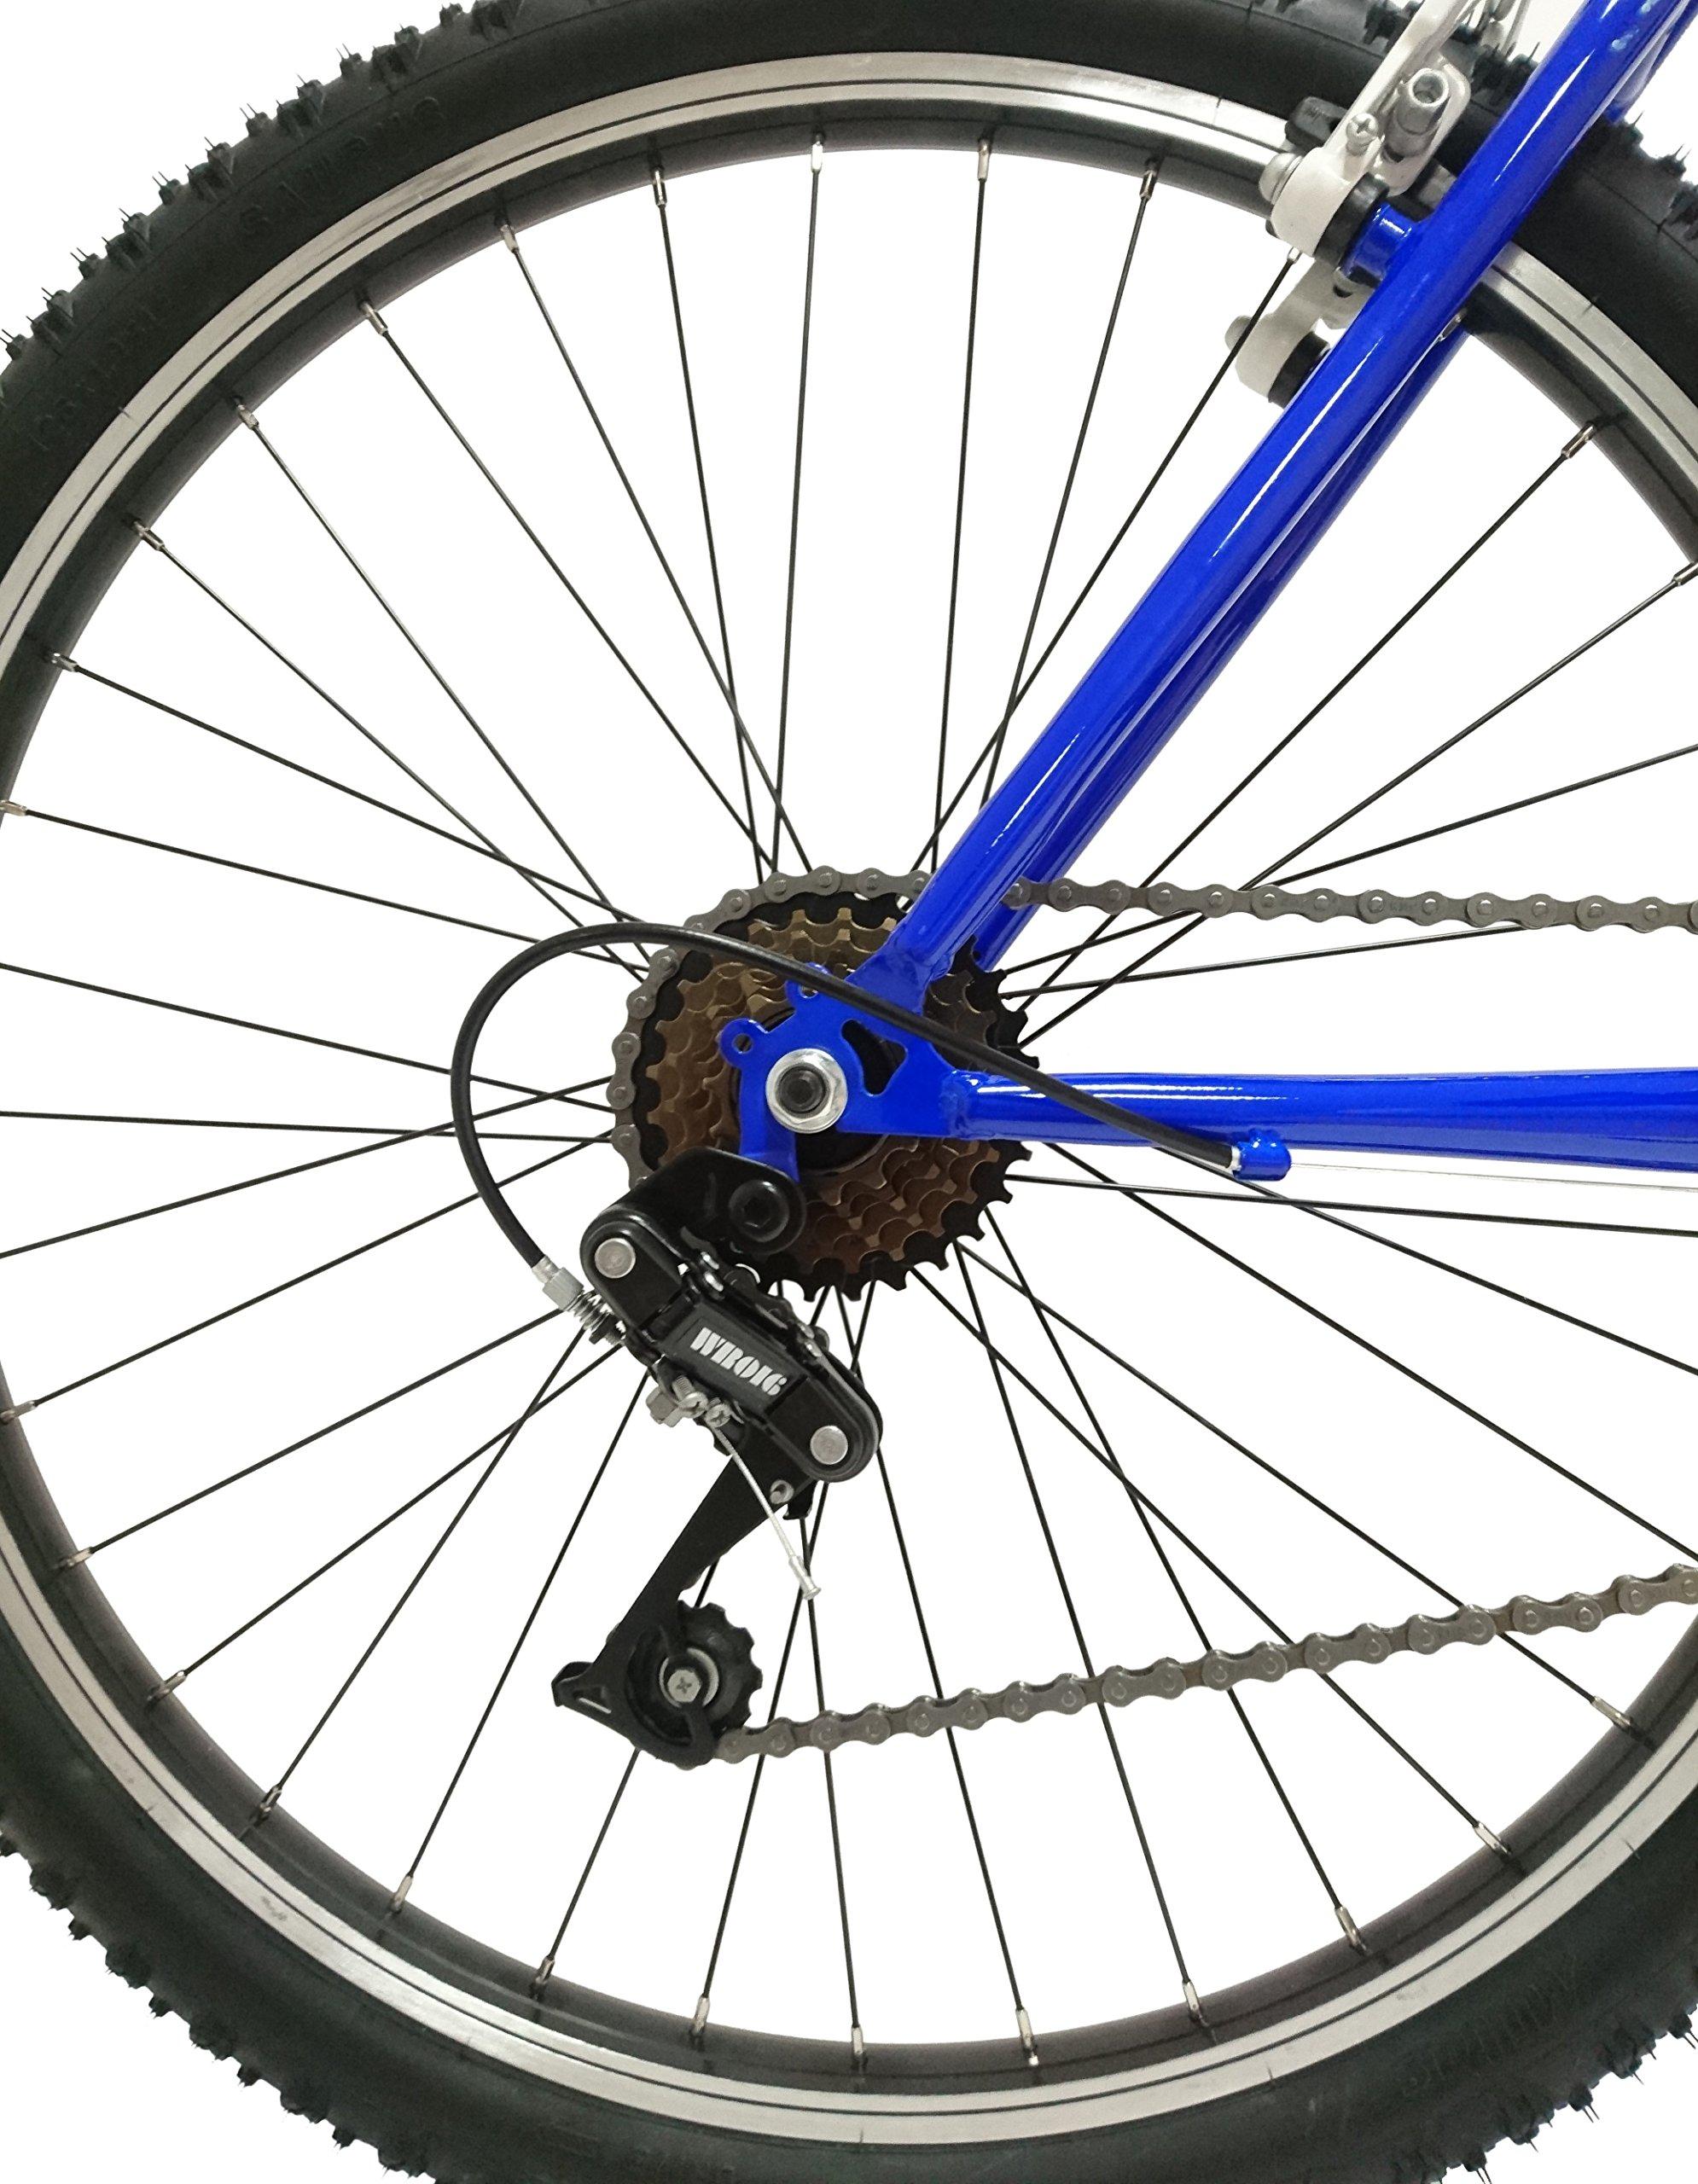 Discovery DP071 - Bicicleta Montaña Mountainbike 26